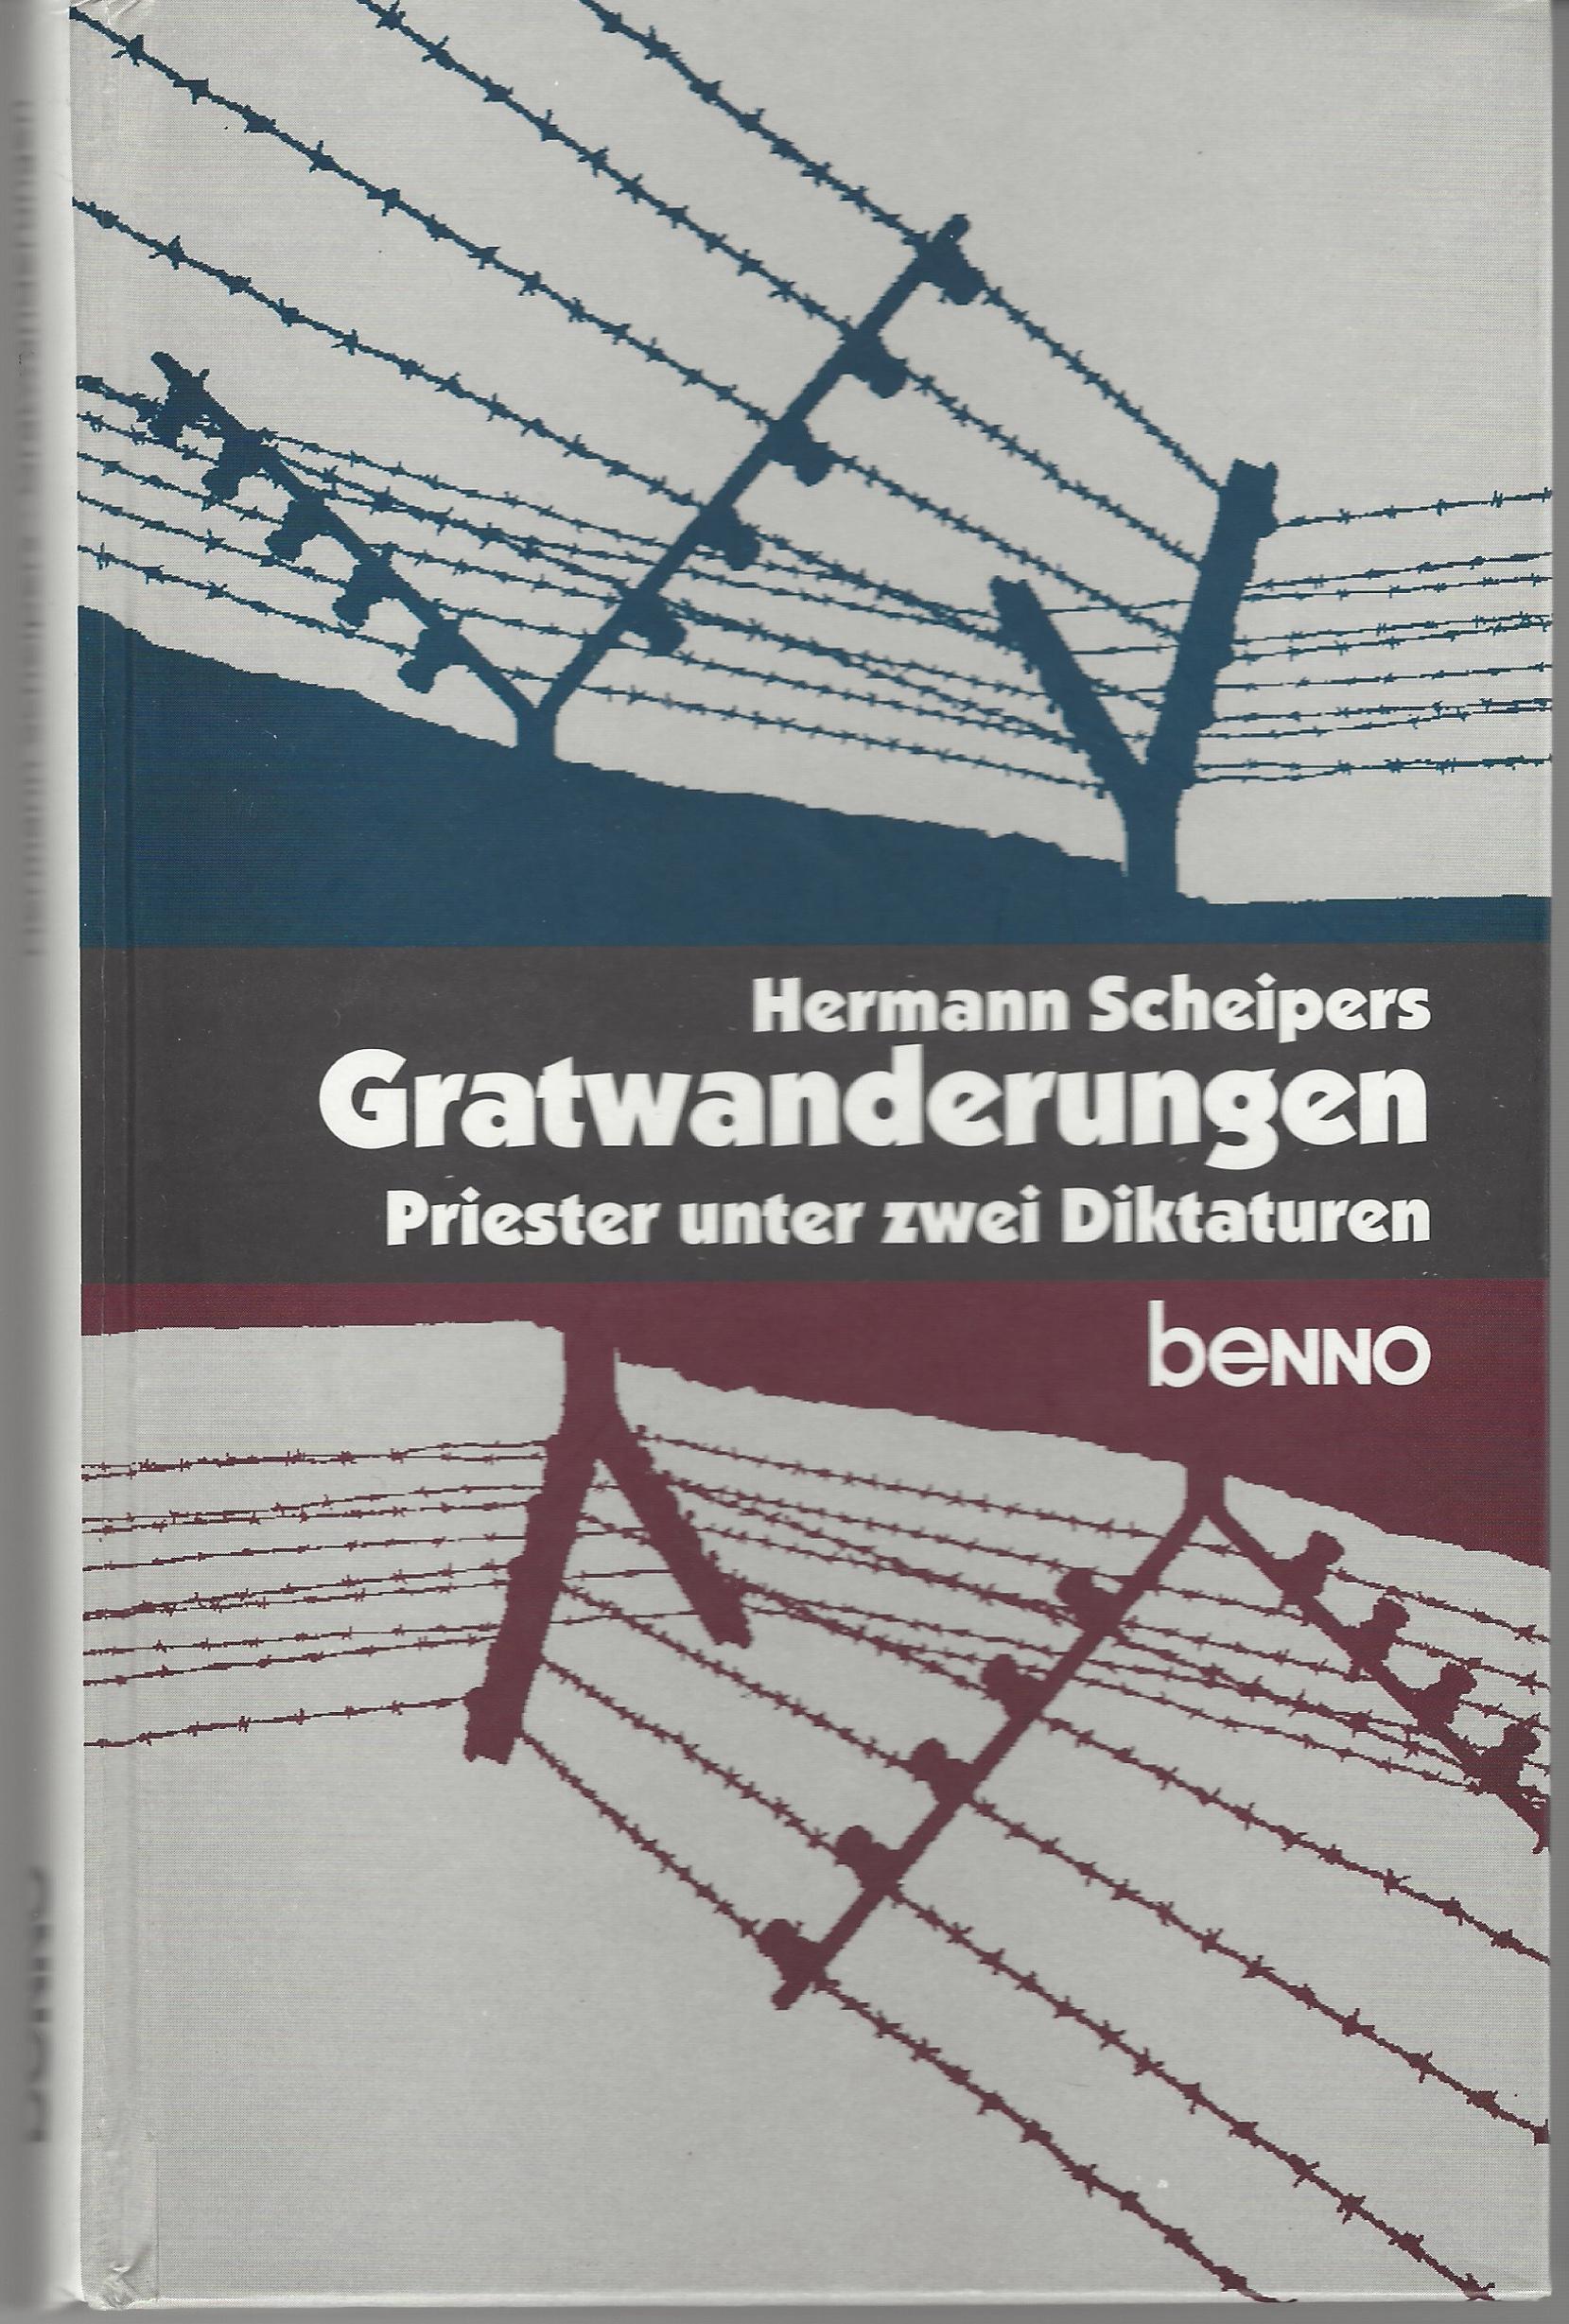 https://www.karl-leisner.de/wp-content/uploads/2013/02/Scheipers.jpg